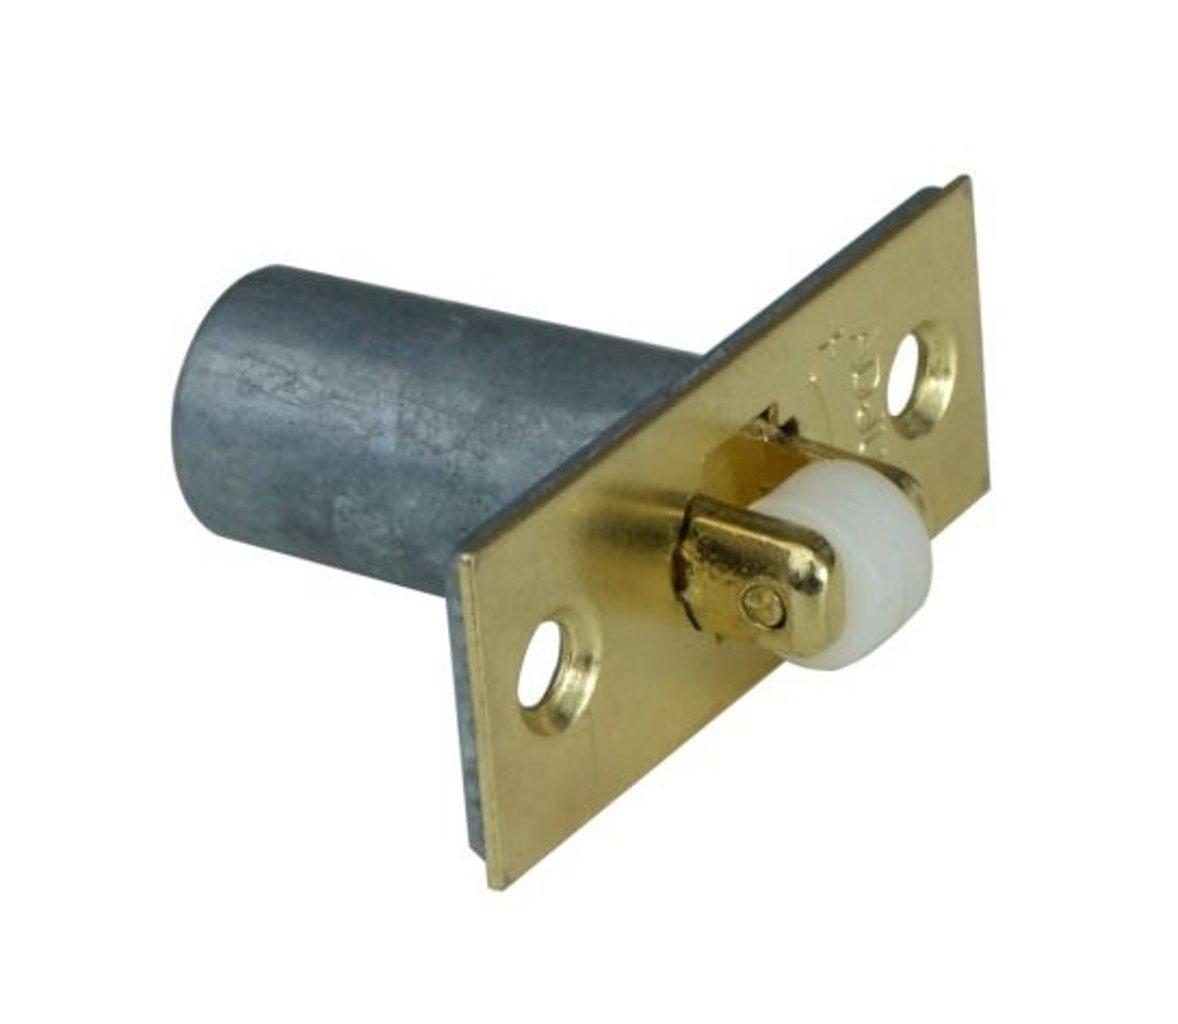 BRASS Adjustable Roller Catch Mortice Door Spring Ball Latch /& Strike Plate